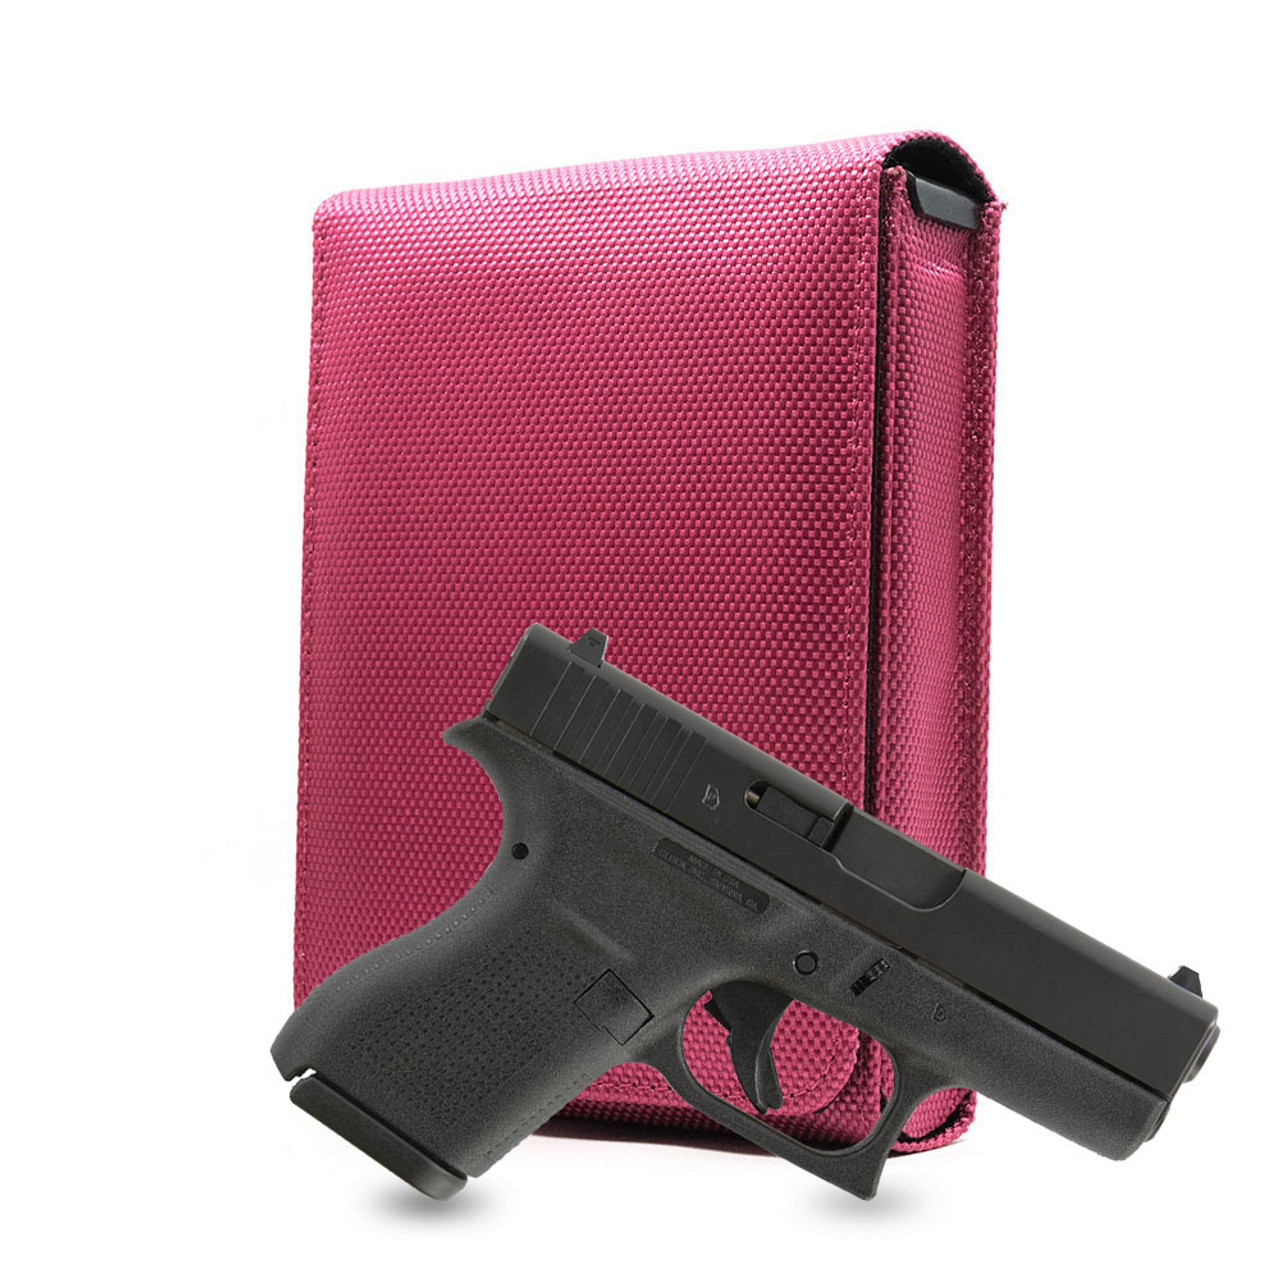 Glock 42 Pink Covert Series Holster